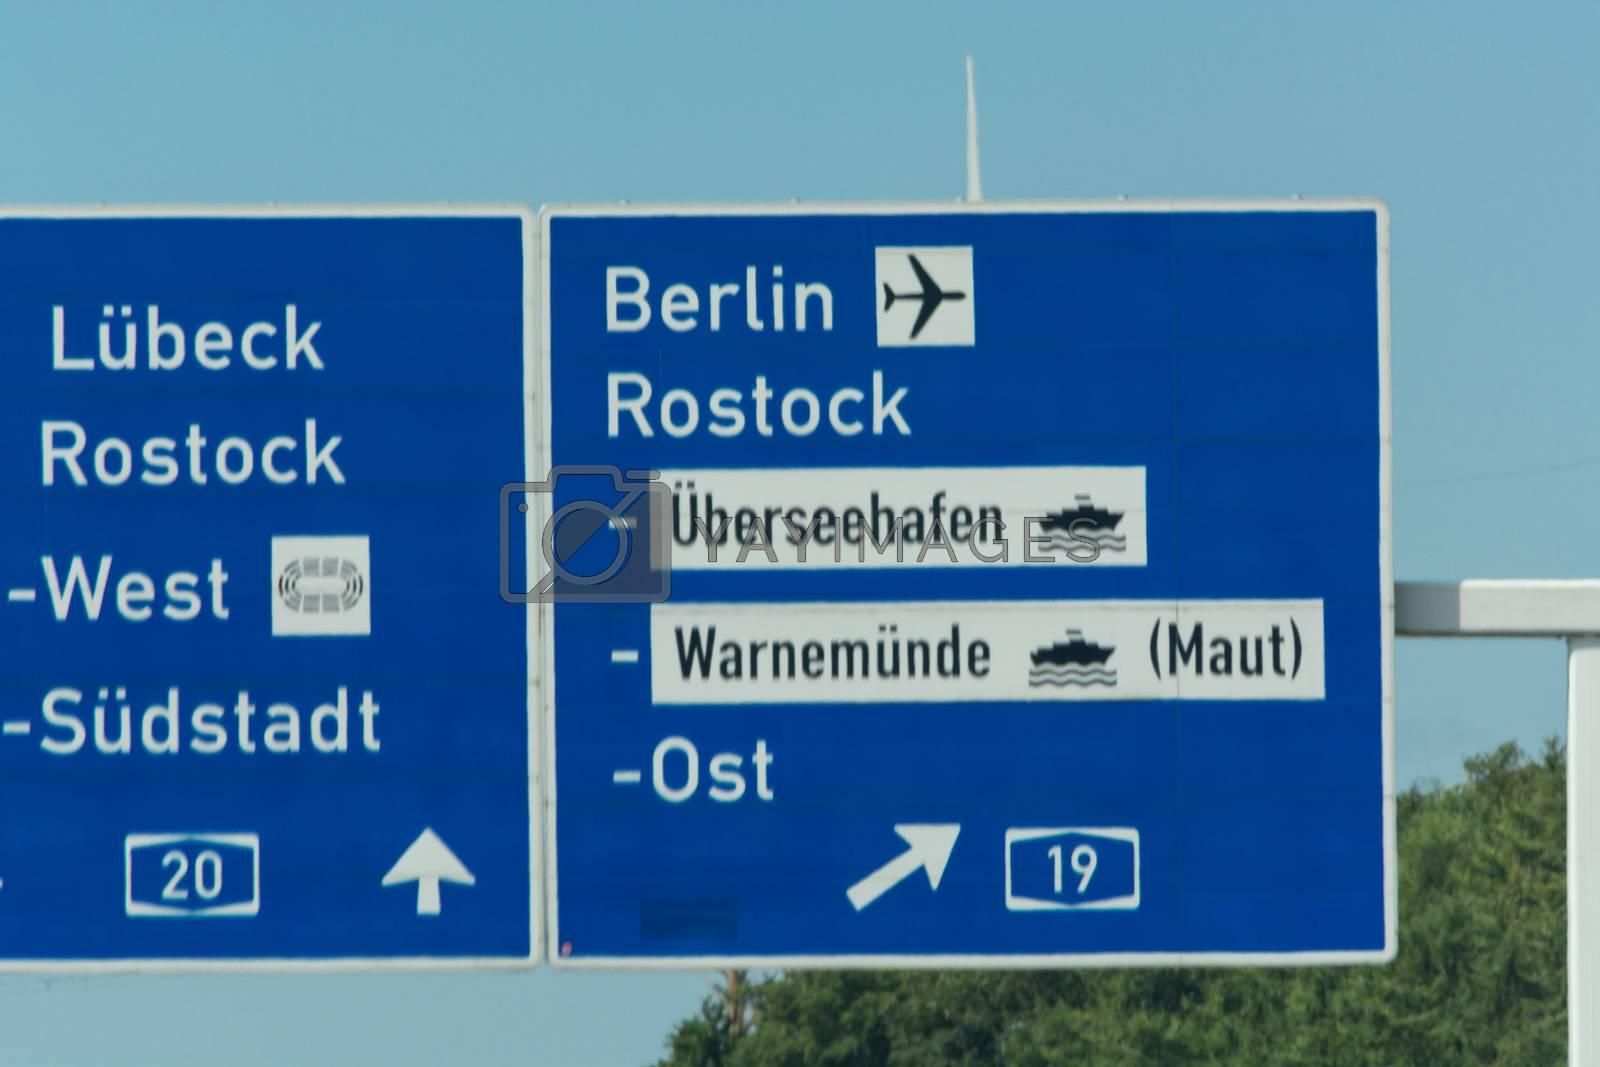 Autobahn sign in Germany Caption on German - city names Berlin,Berlin Airport, Rostock, Lübeck